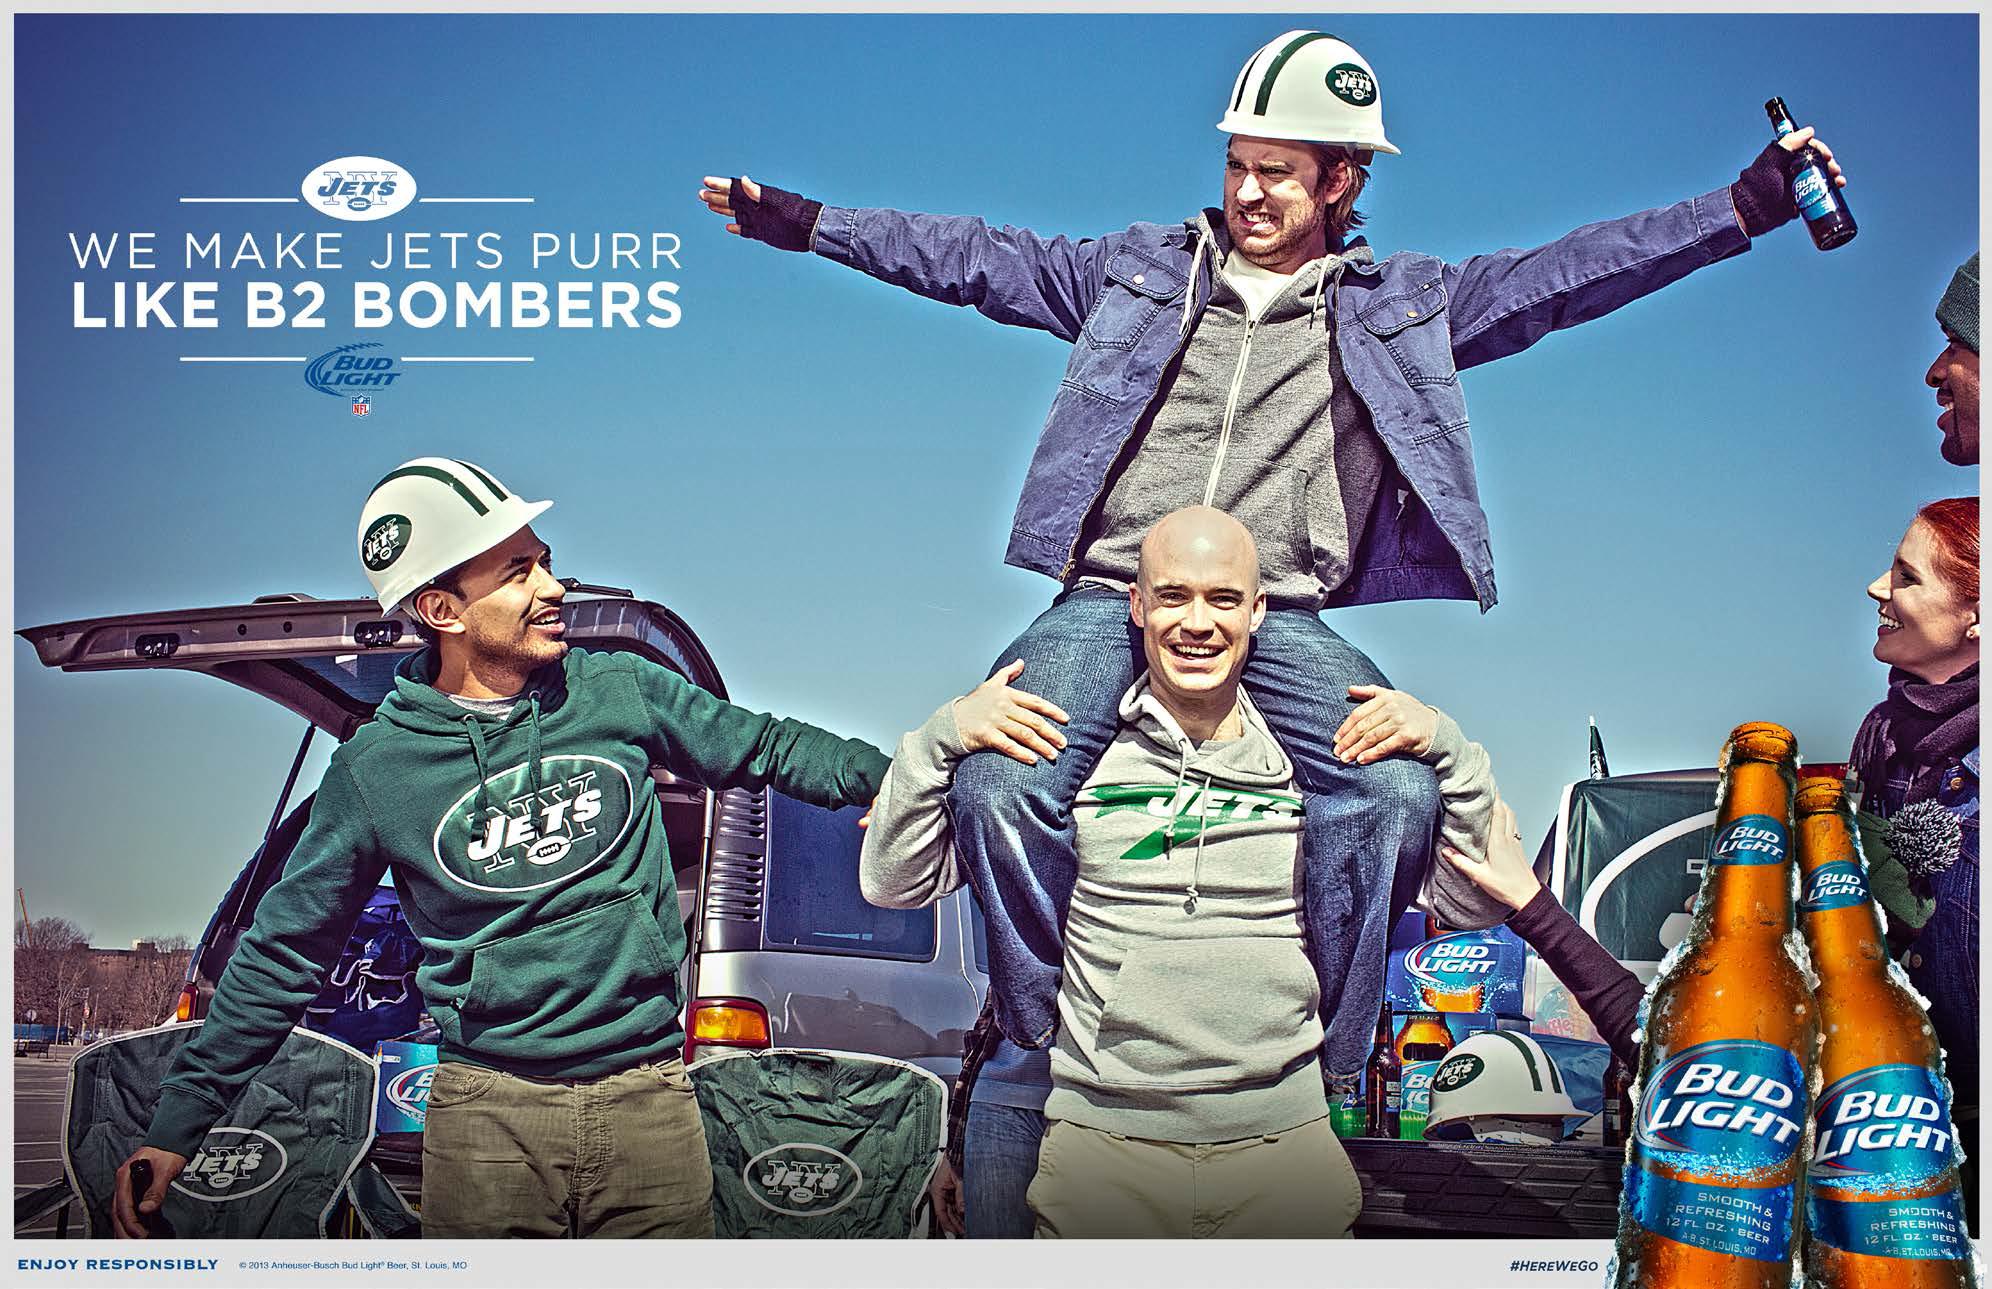 b2bombers